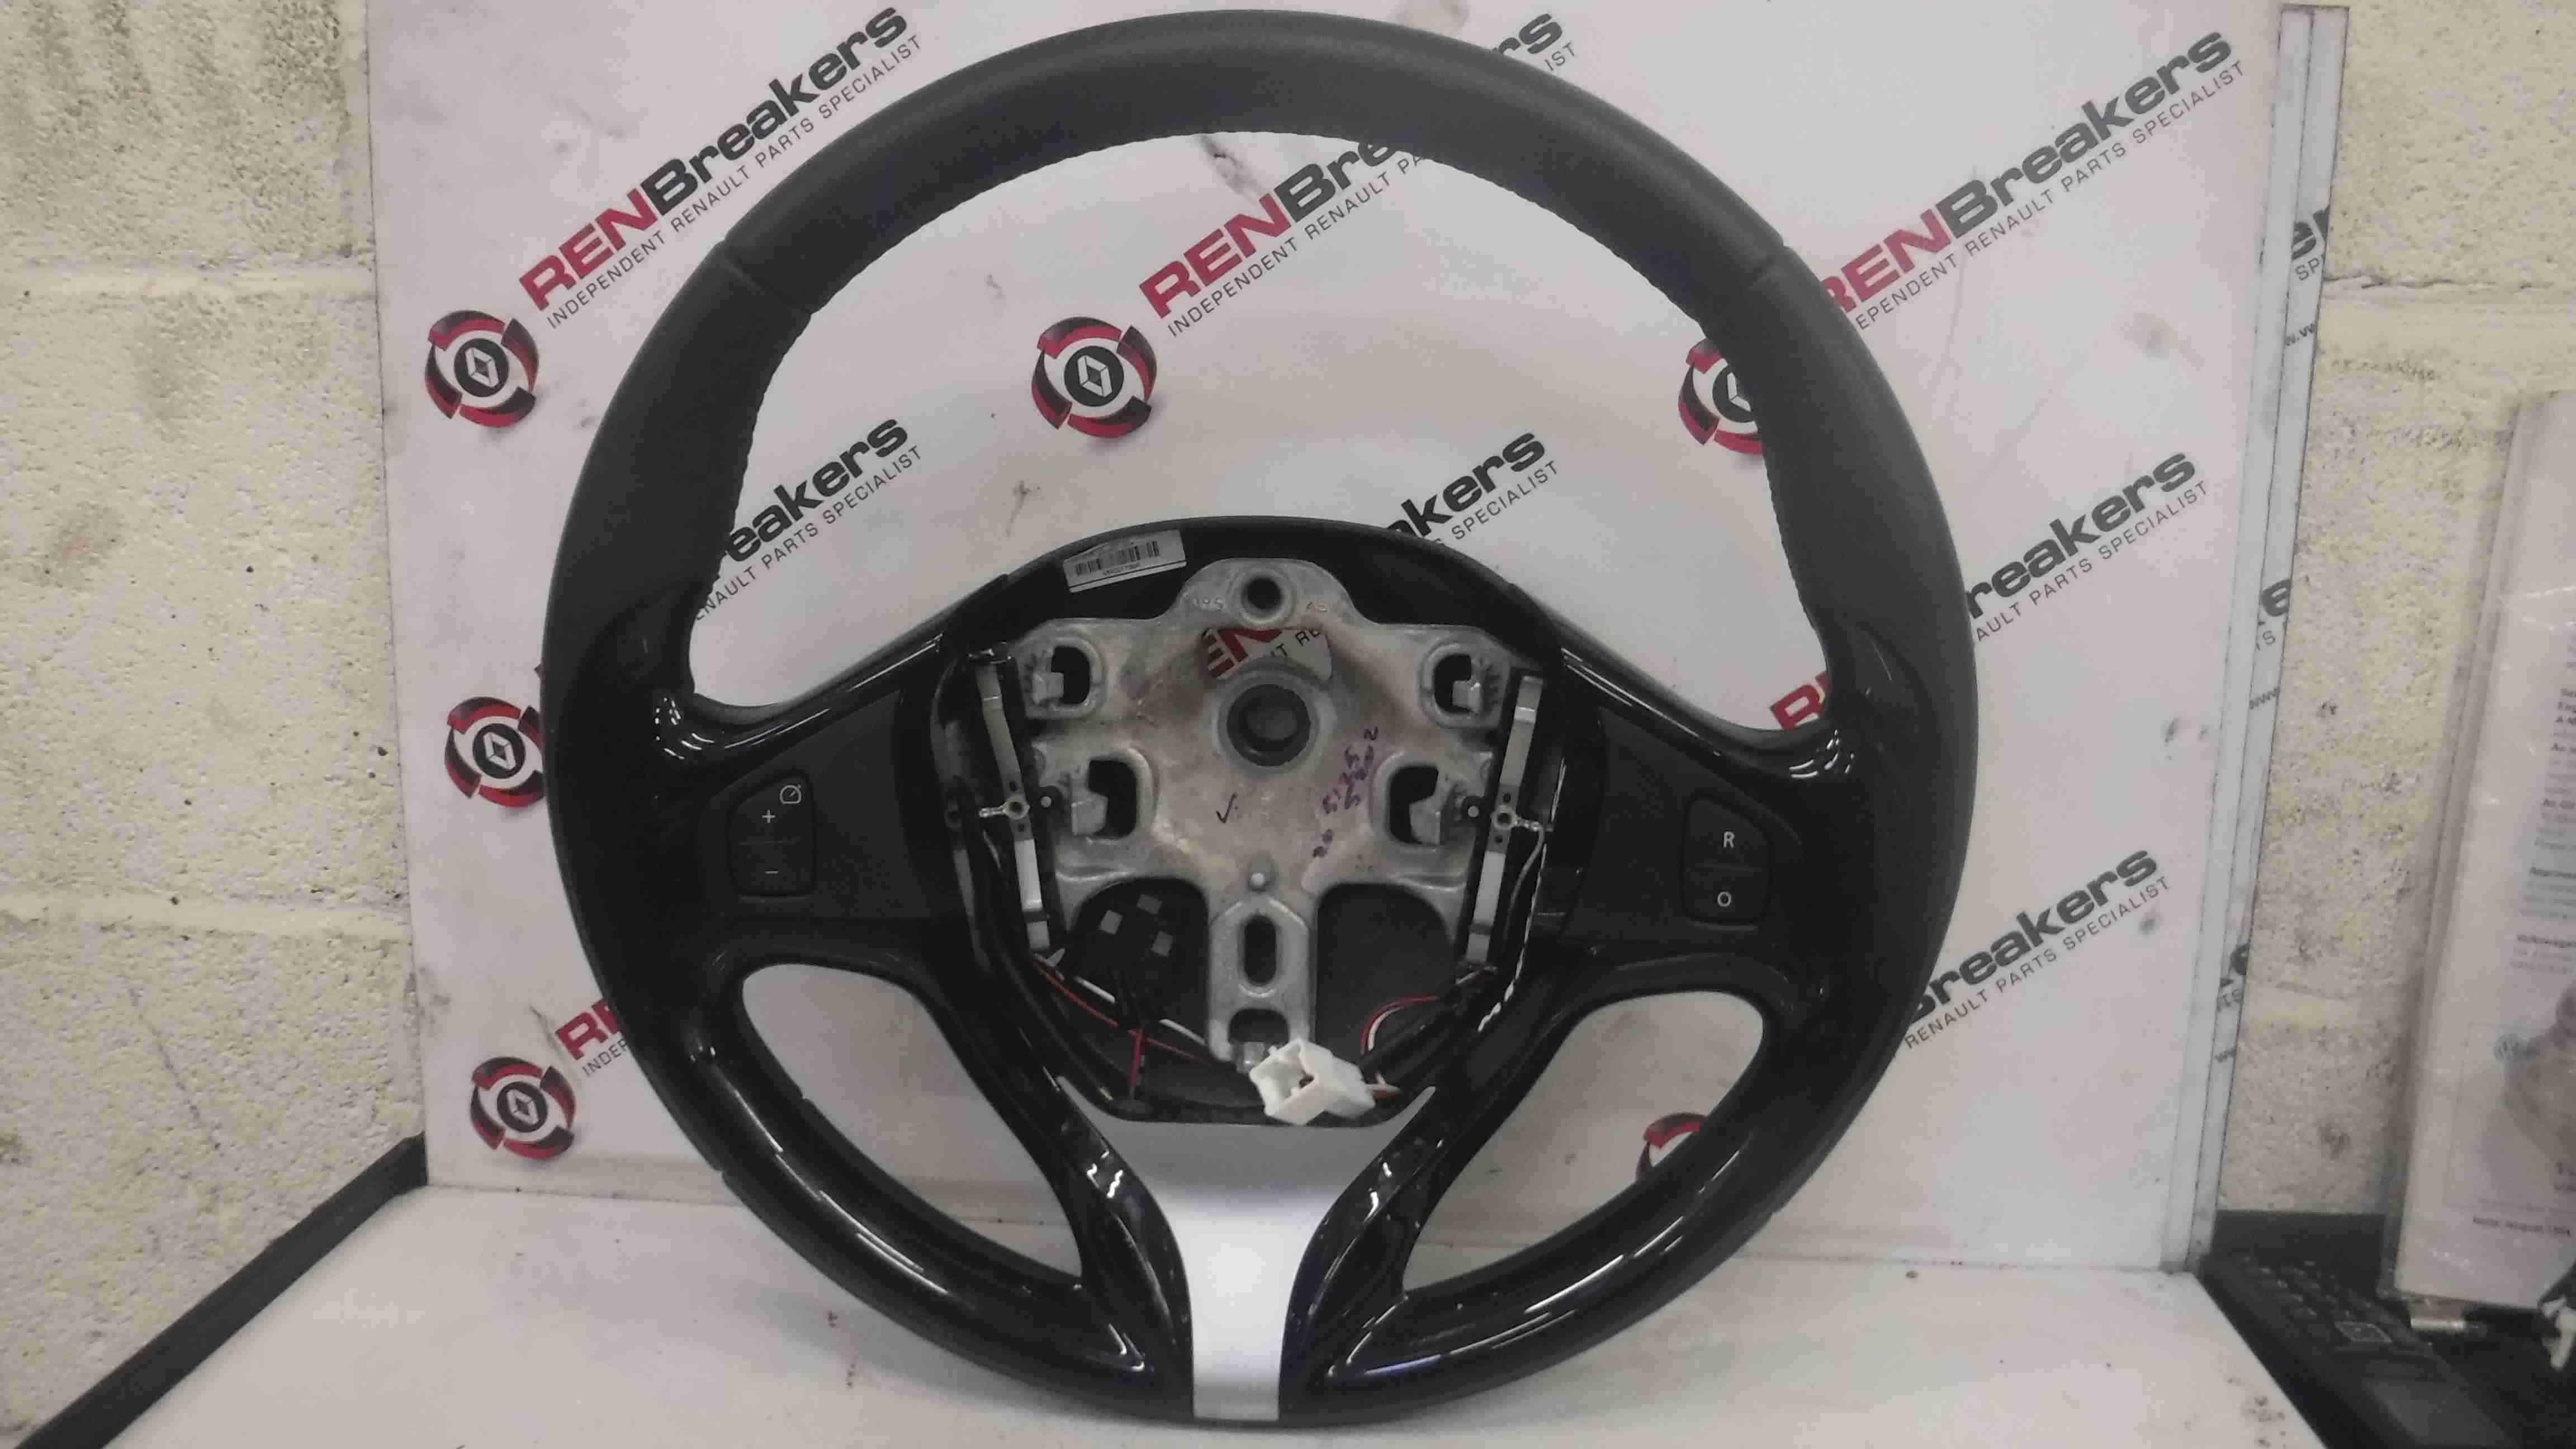 Renault Clio MK4 2013-2015 Steering Wheel Cruise Control 484001738R